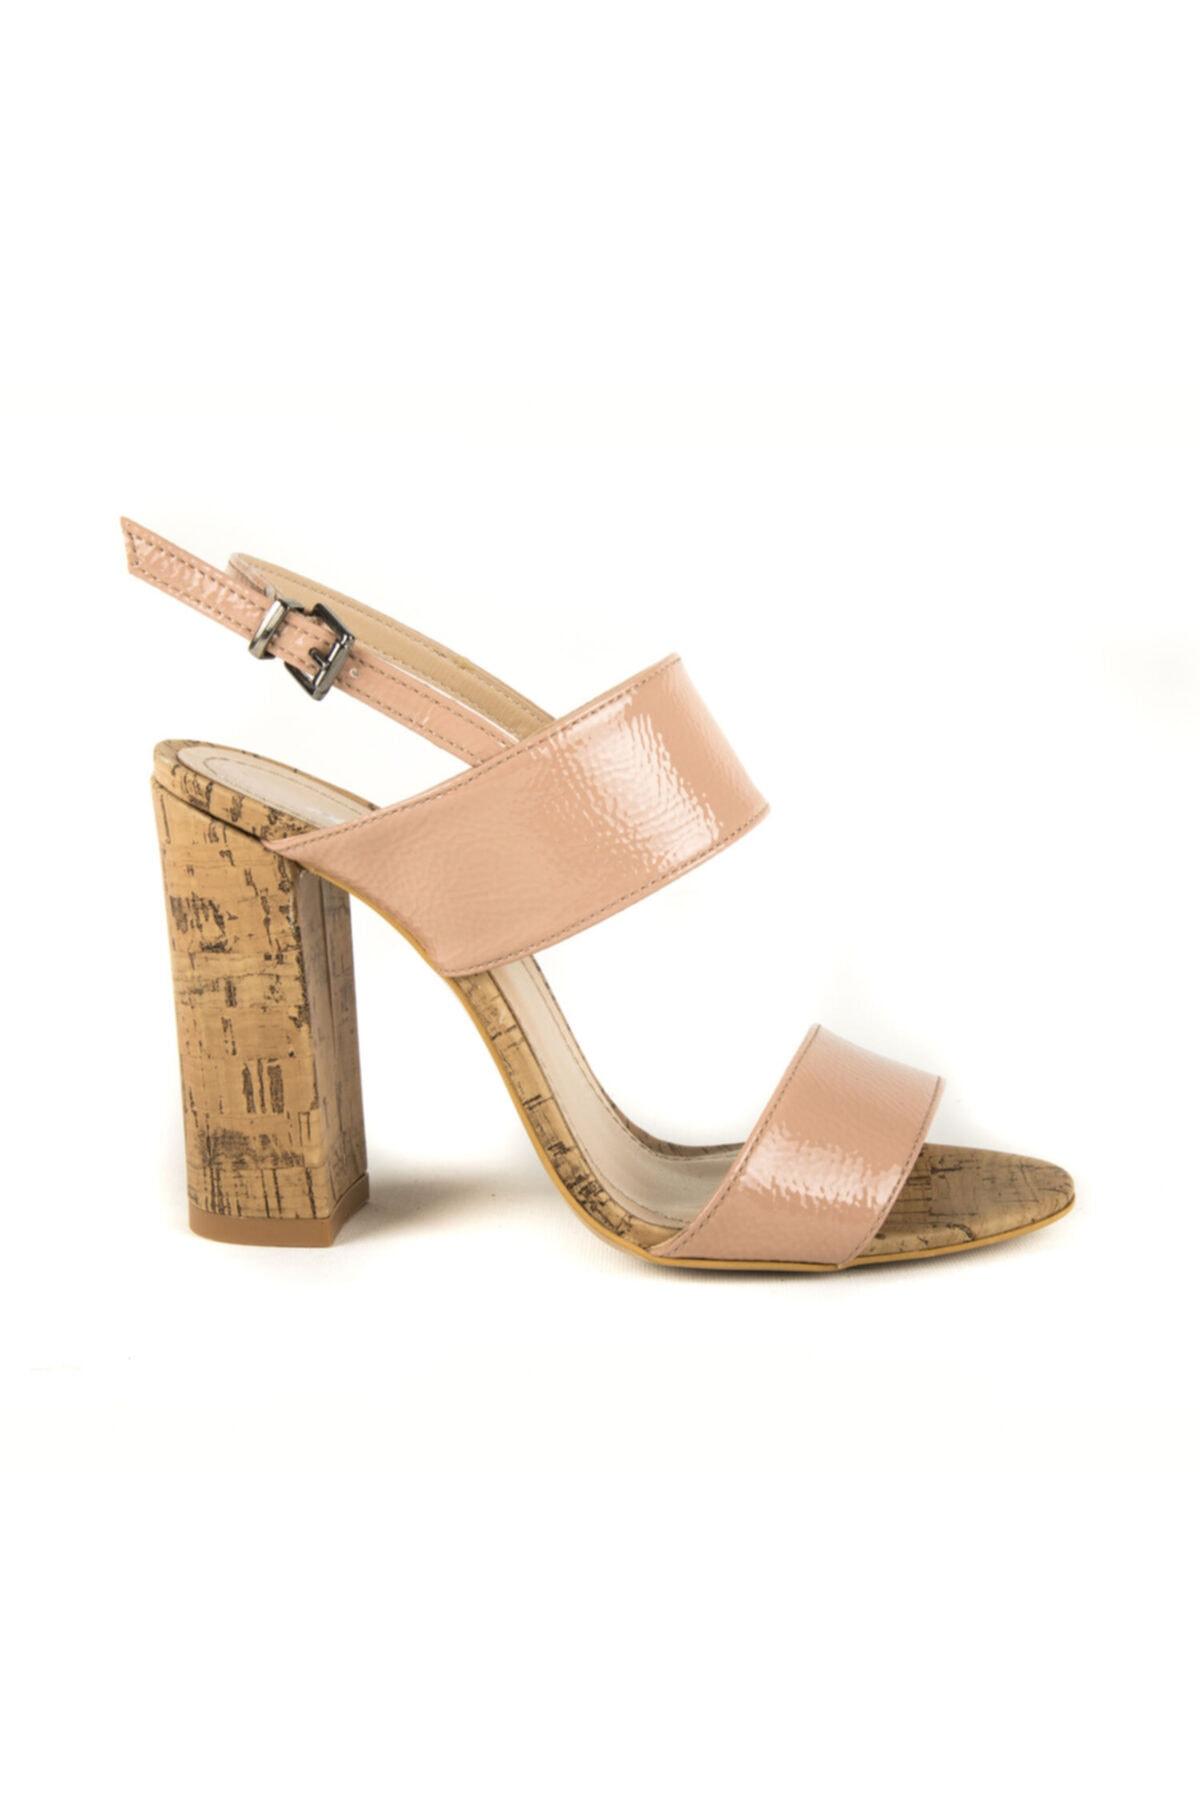 DİVUM Pudra Kırık Rugan Topuklu Ayakkabı 1